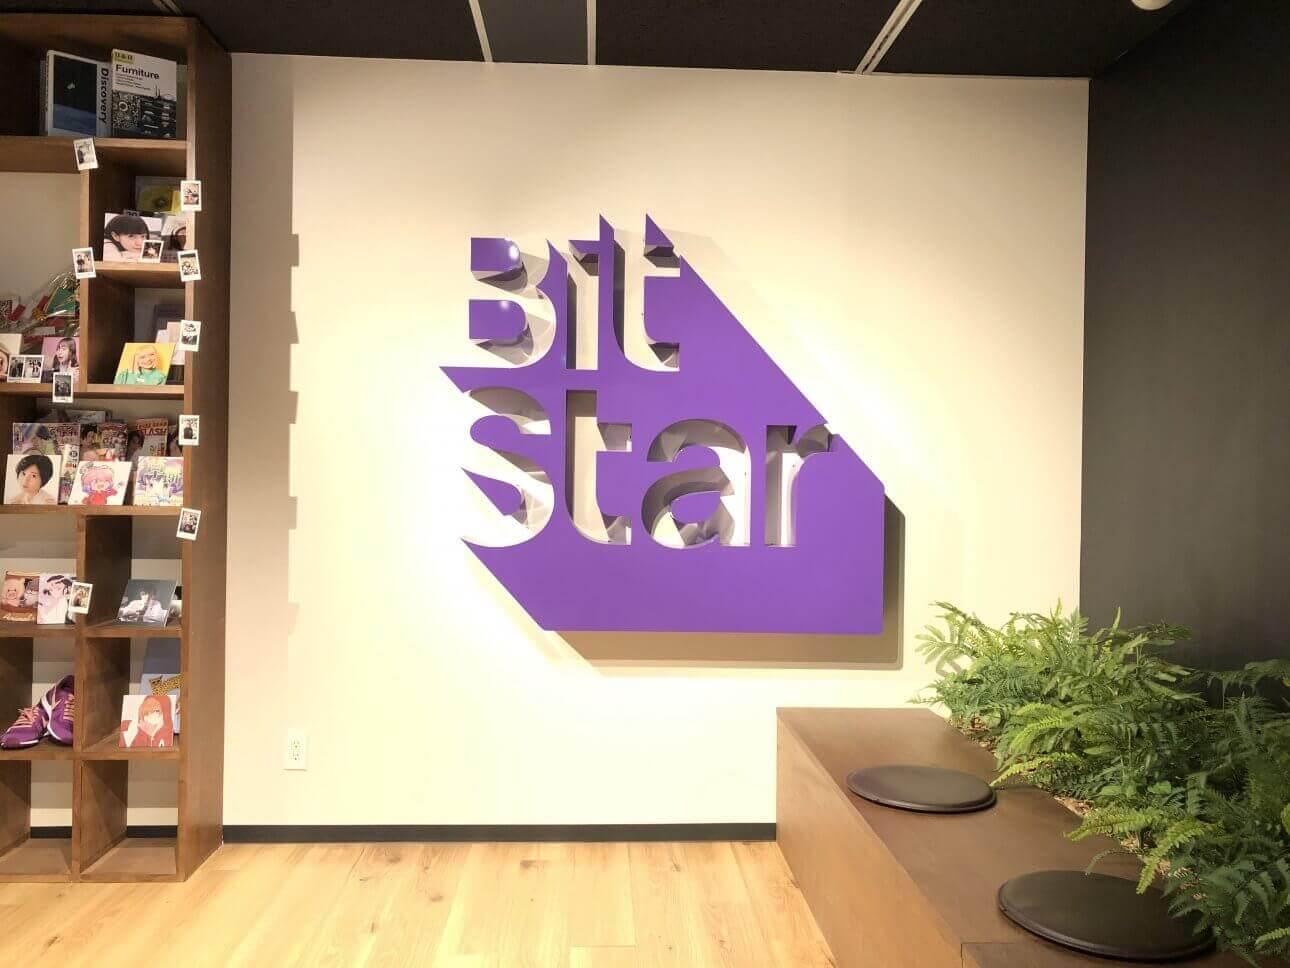 BitStar様_リーガレッジ導入事例